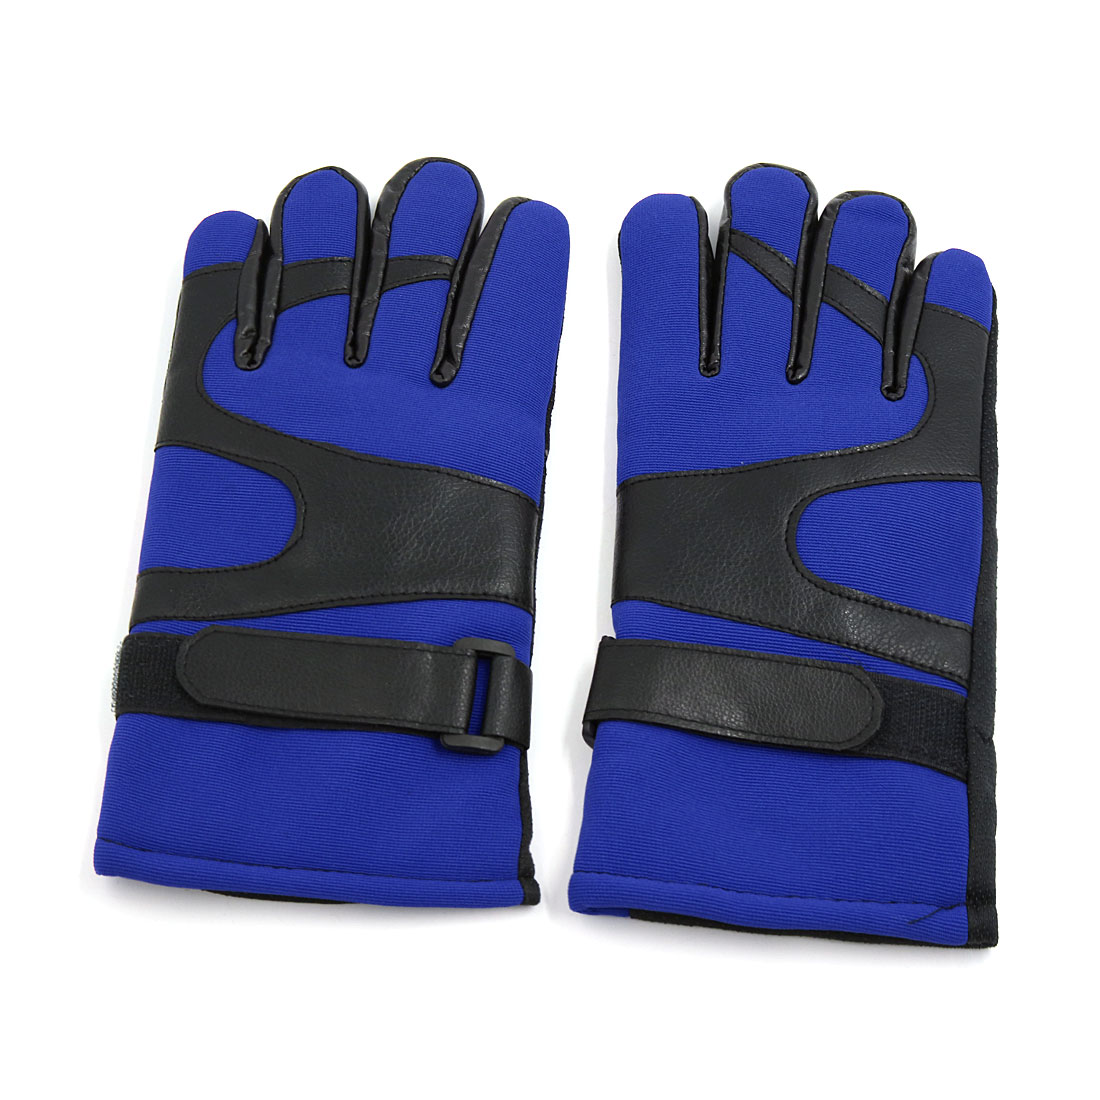 Unique Bargains Winte Blue Nonslip Plush Lining Full Finger Gloves Pair for Motorcycle Motorbike